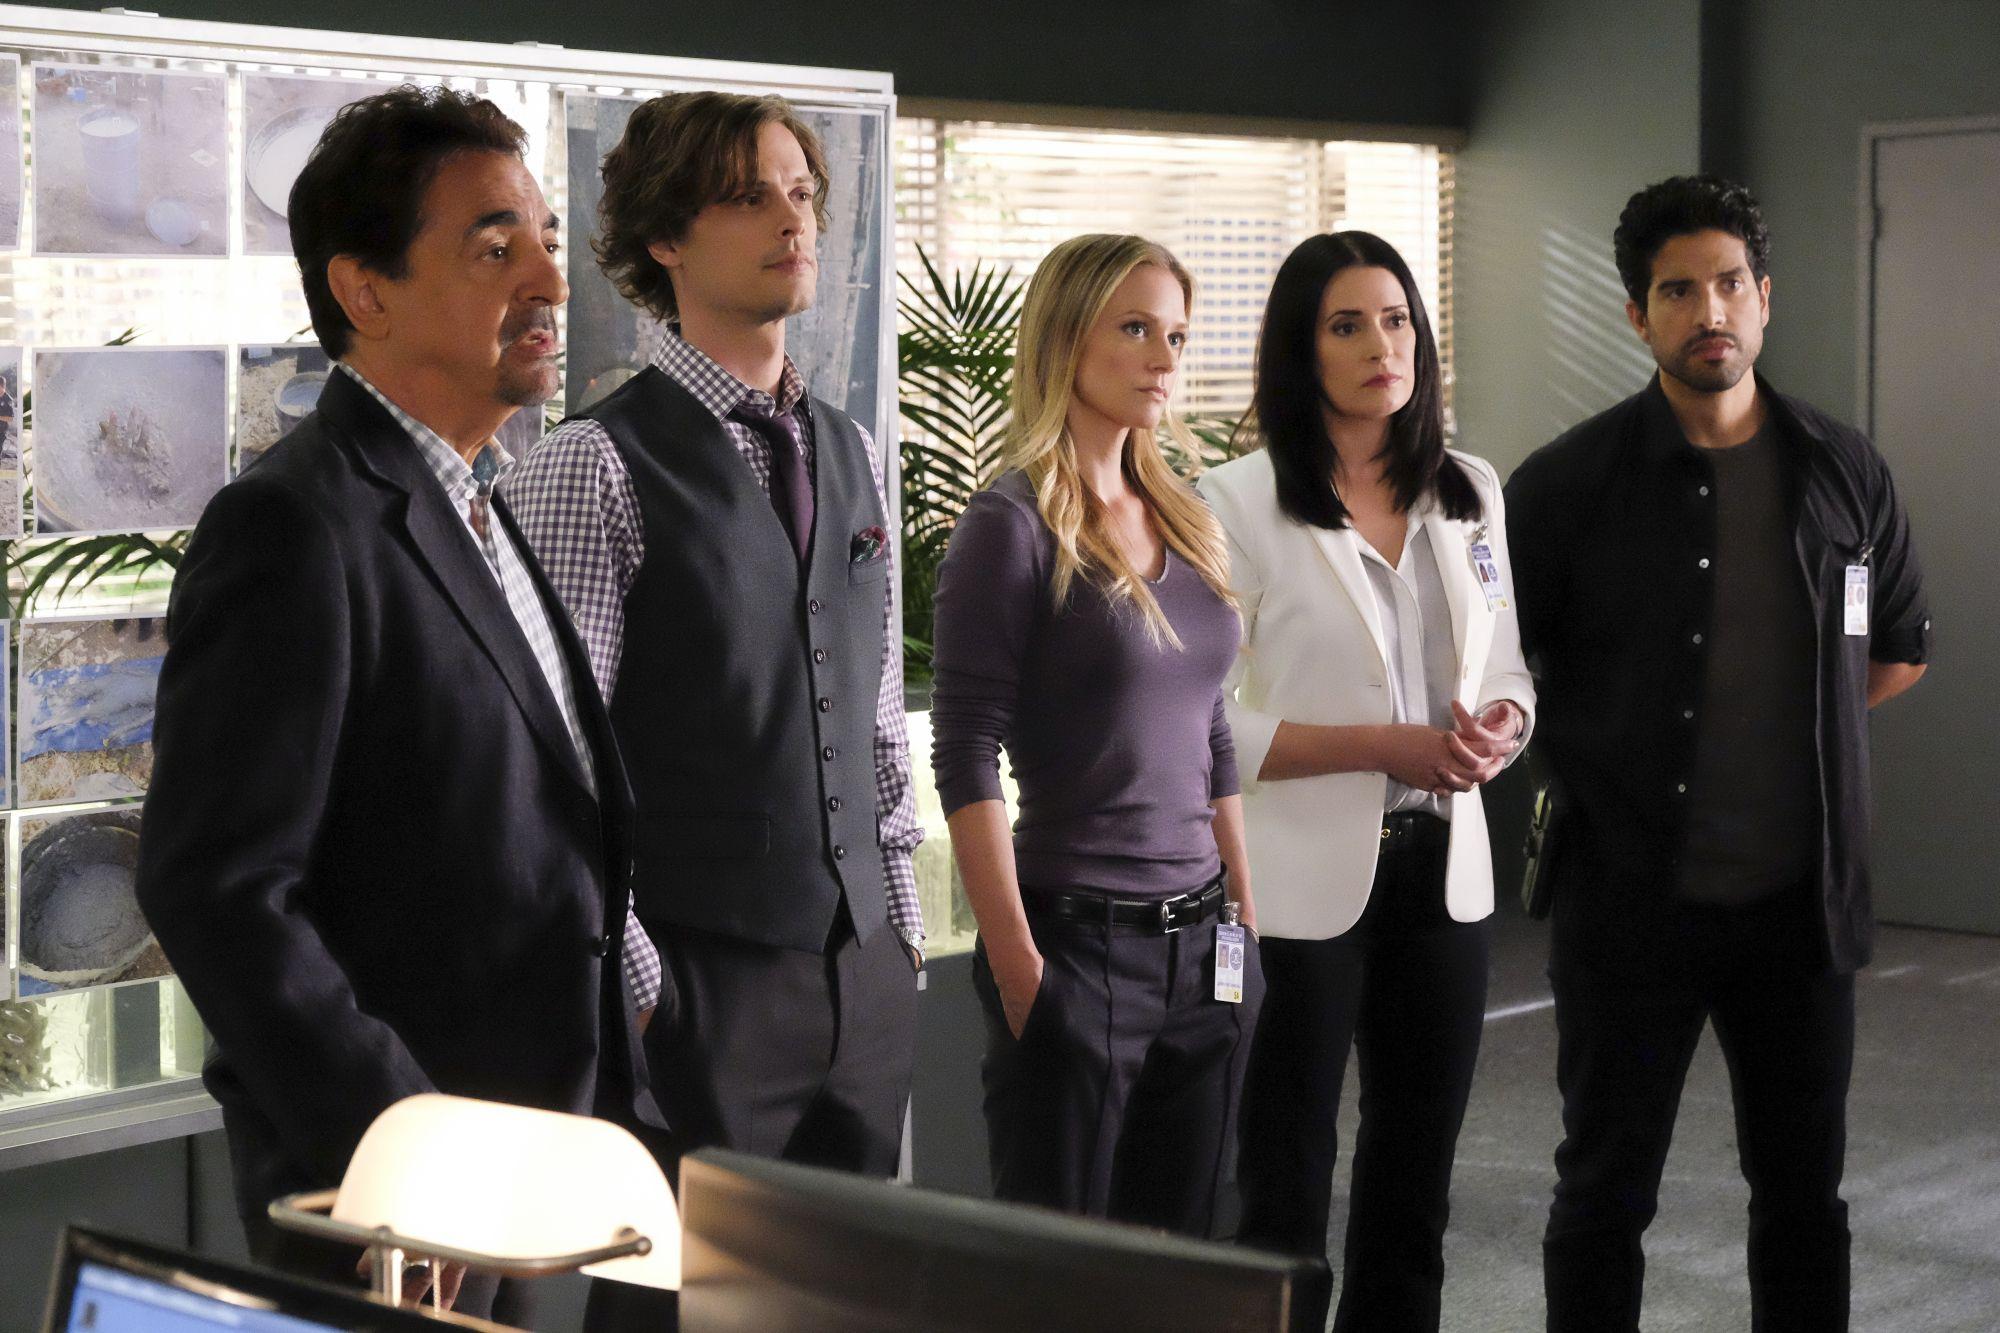 Criminal Minds' Cast from Season 1 to Season 14